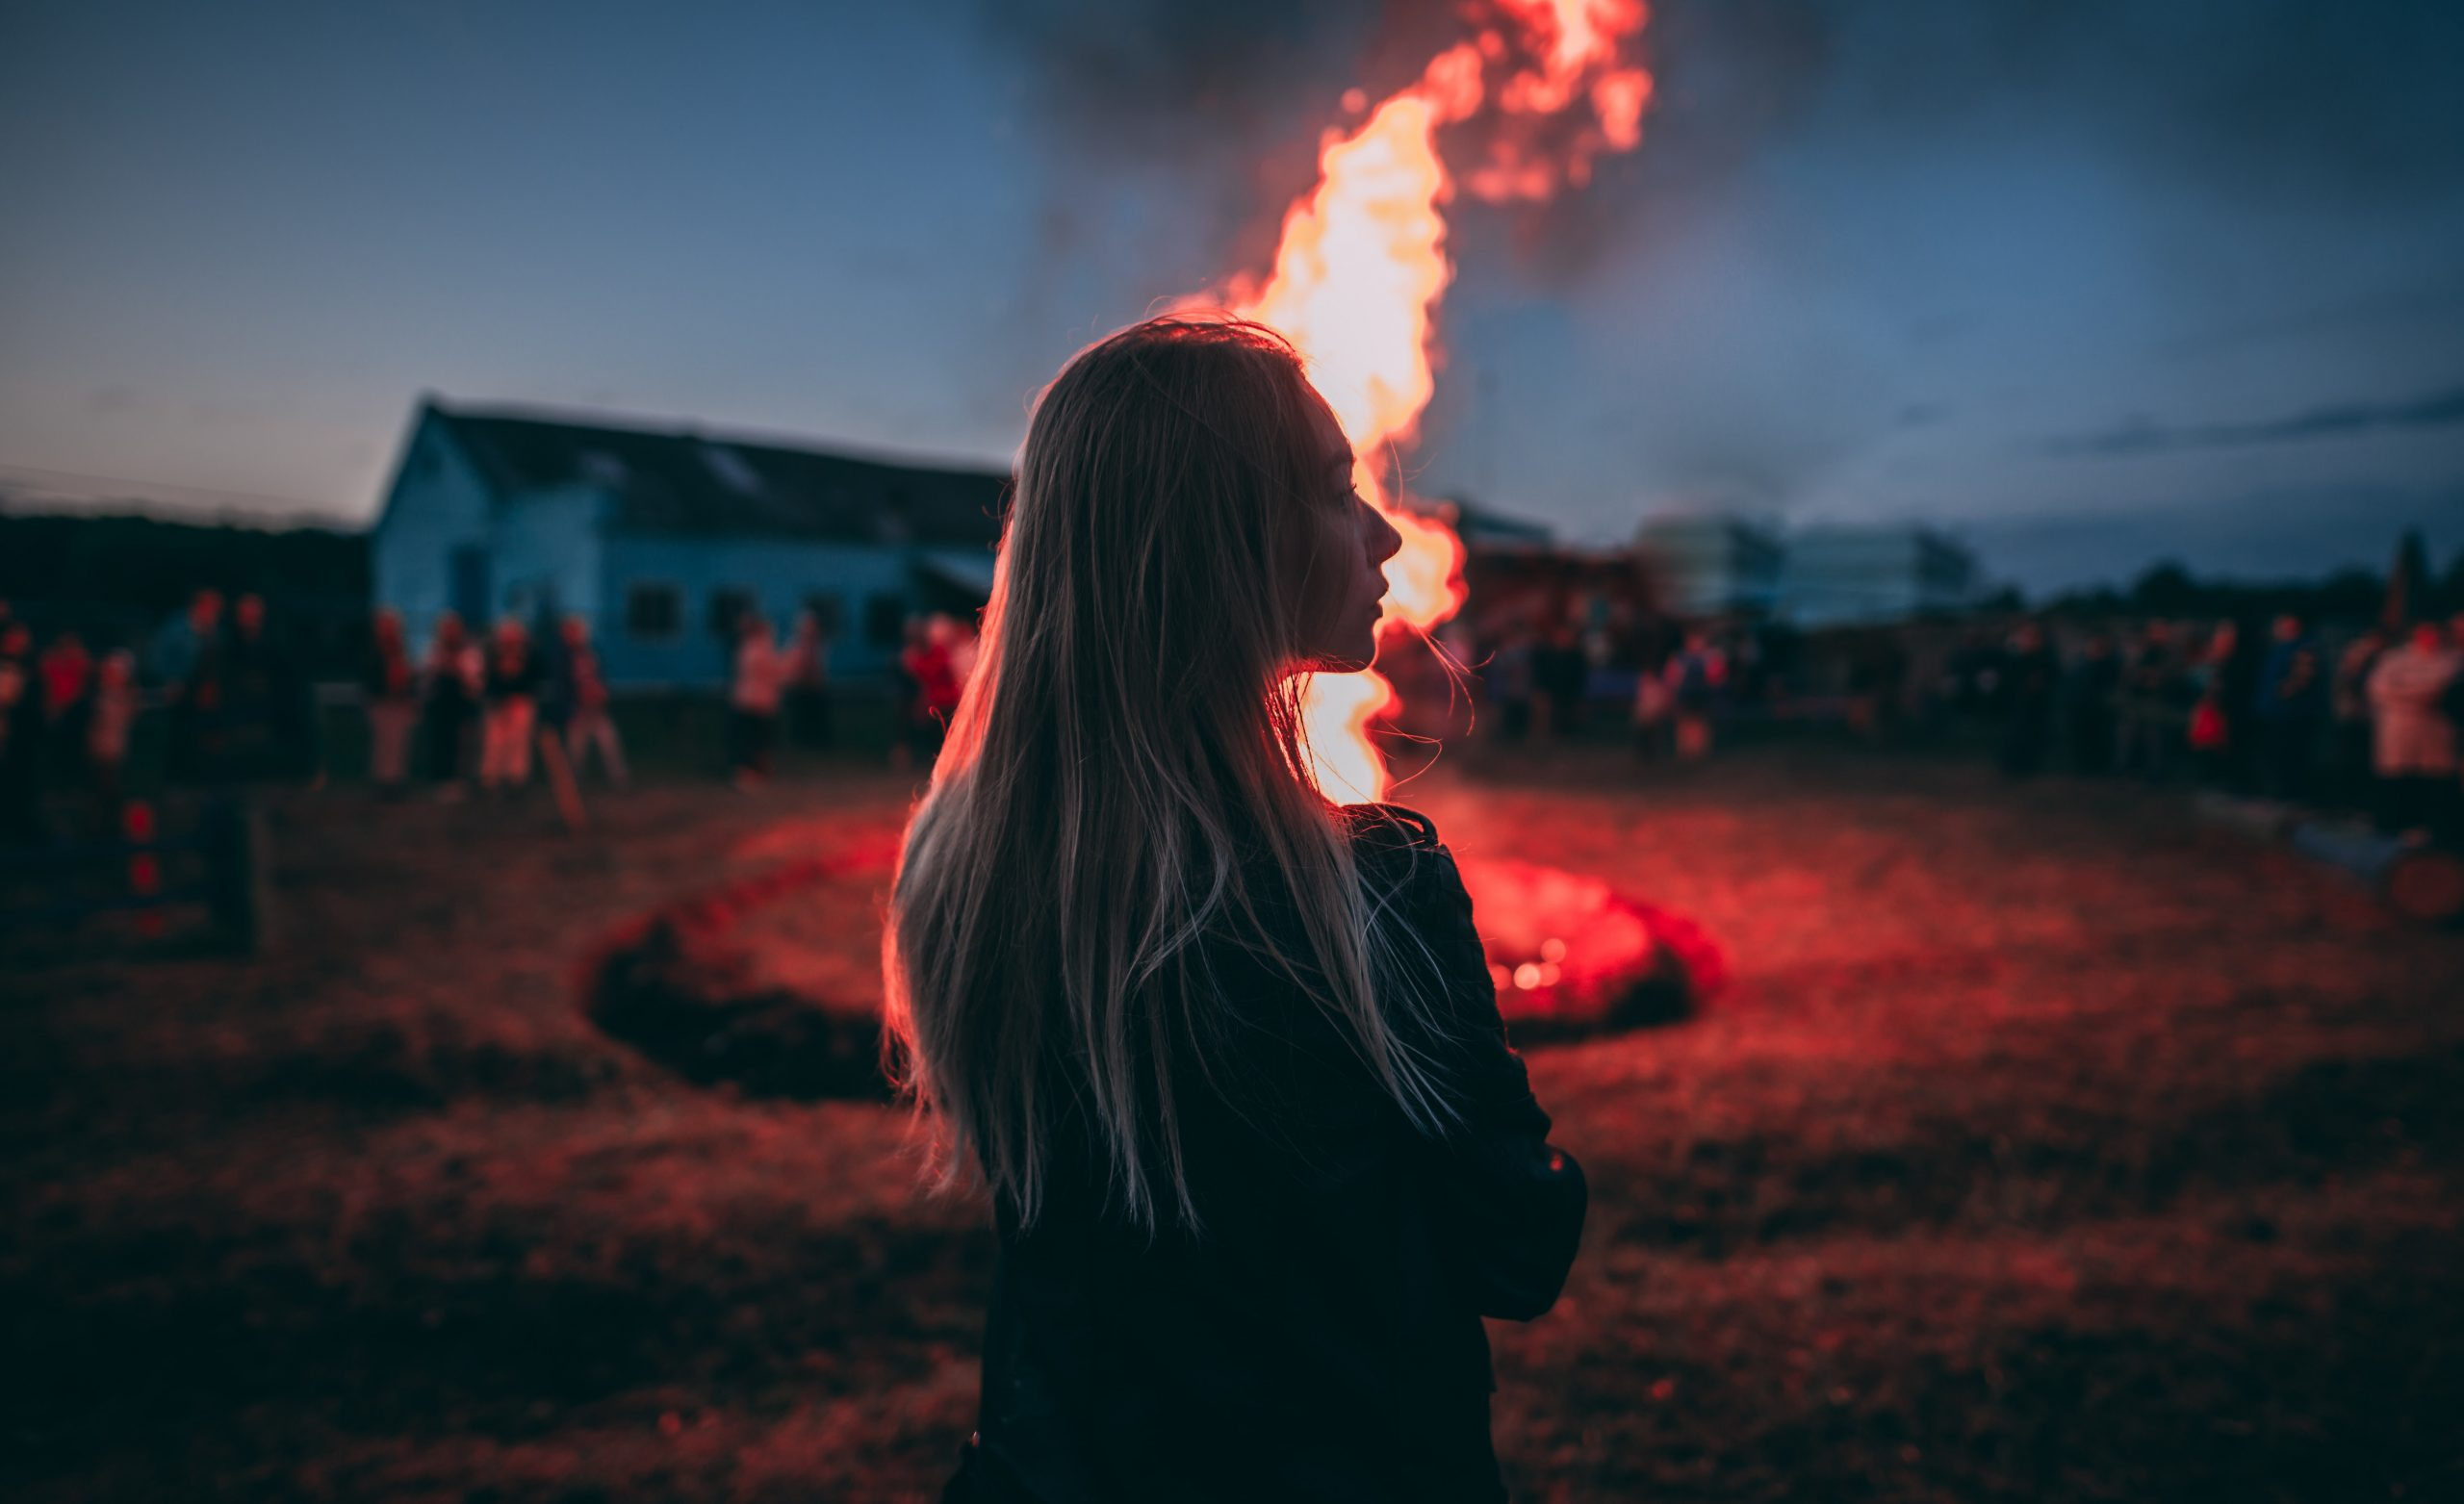 Slow-burn crazy-making behaviours. Photo by Vadim Sadovski on Unsplash